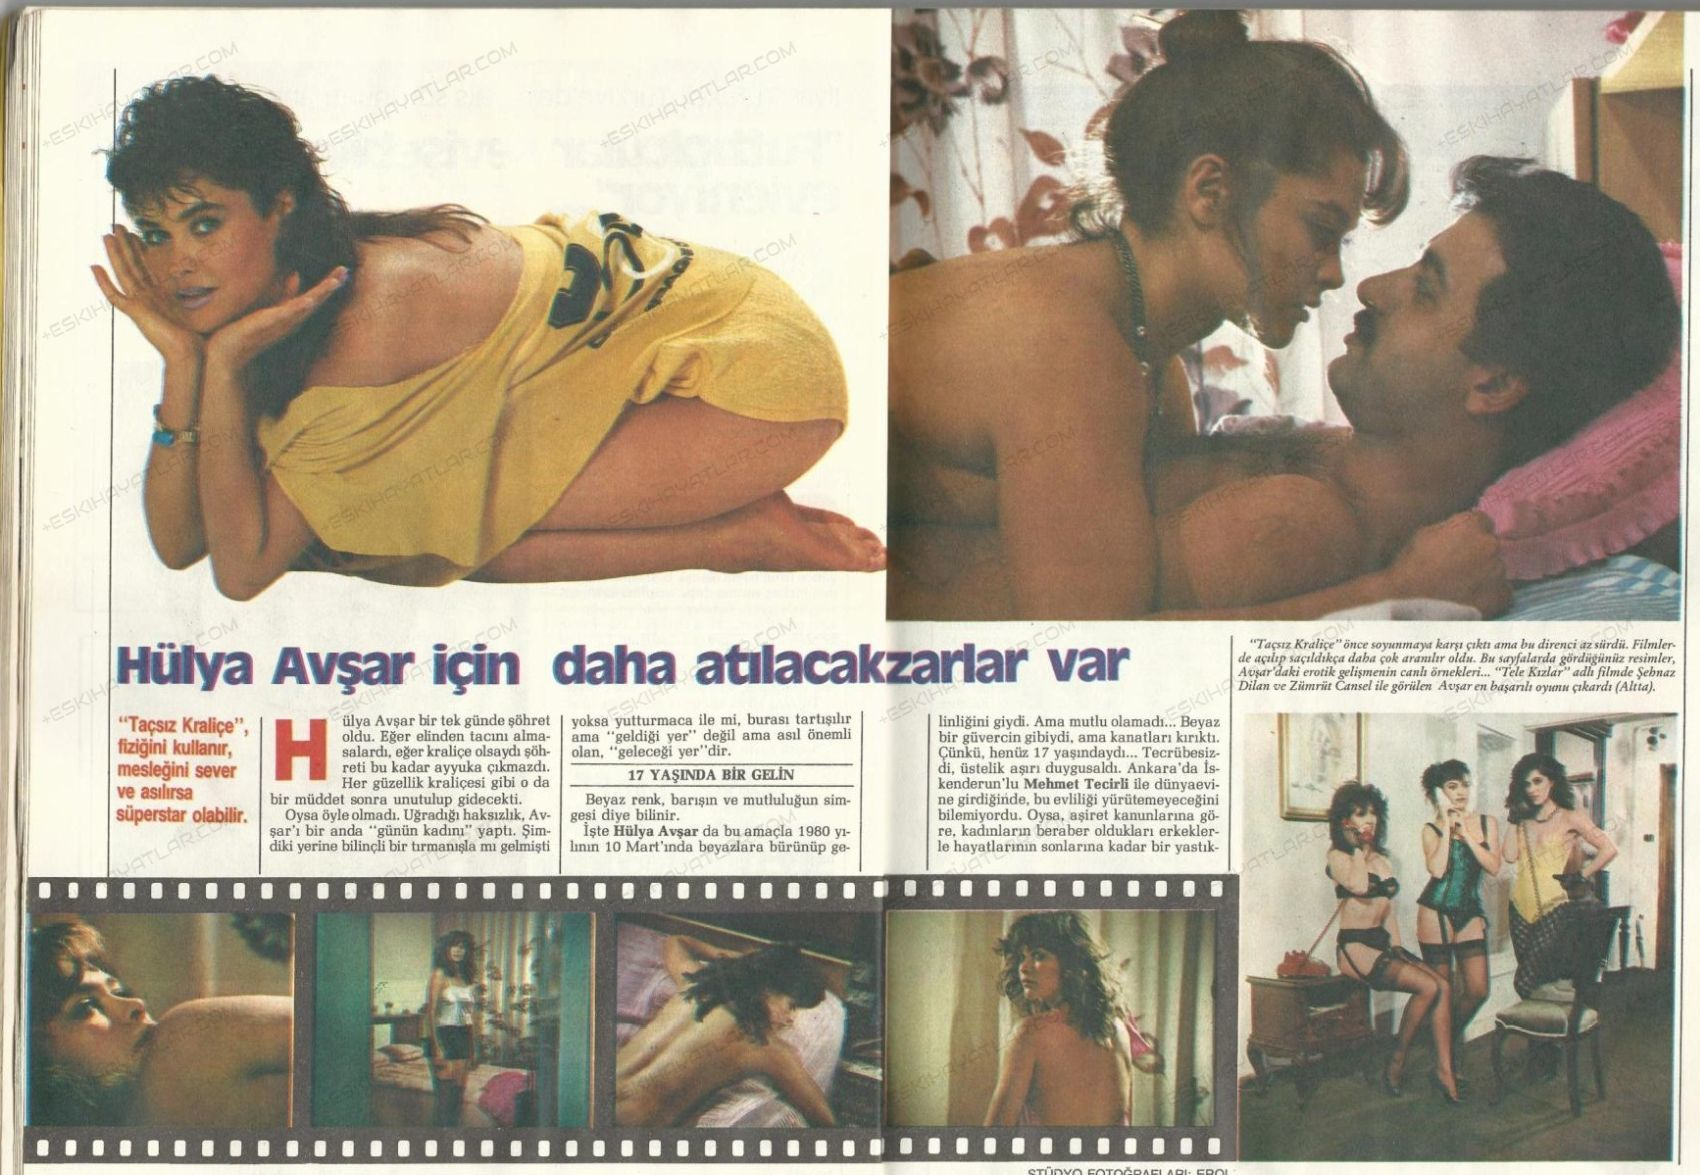 0405-hulya-avsar-1985-erkekce-dergisi-tele-kizlar-filmi-fotograflari-tarik-akan-kenan-kalav-tacsiz-kralice-hulya-avsar (4)